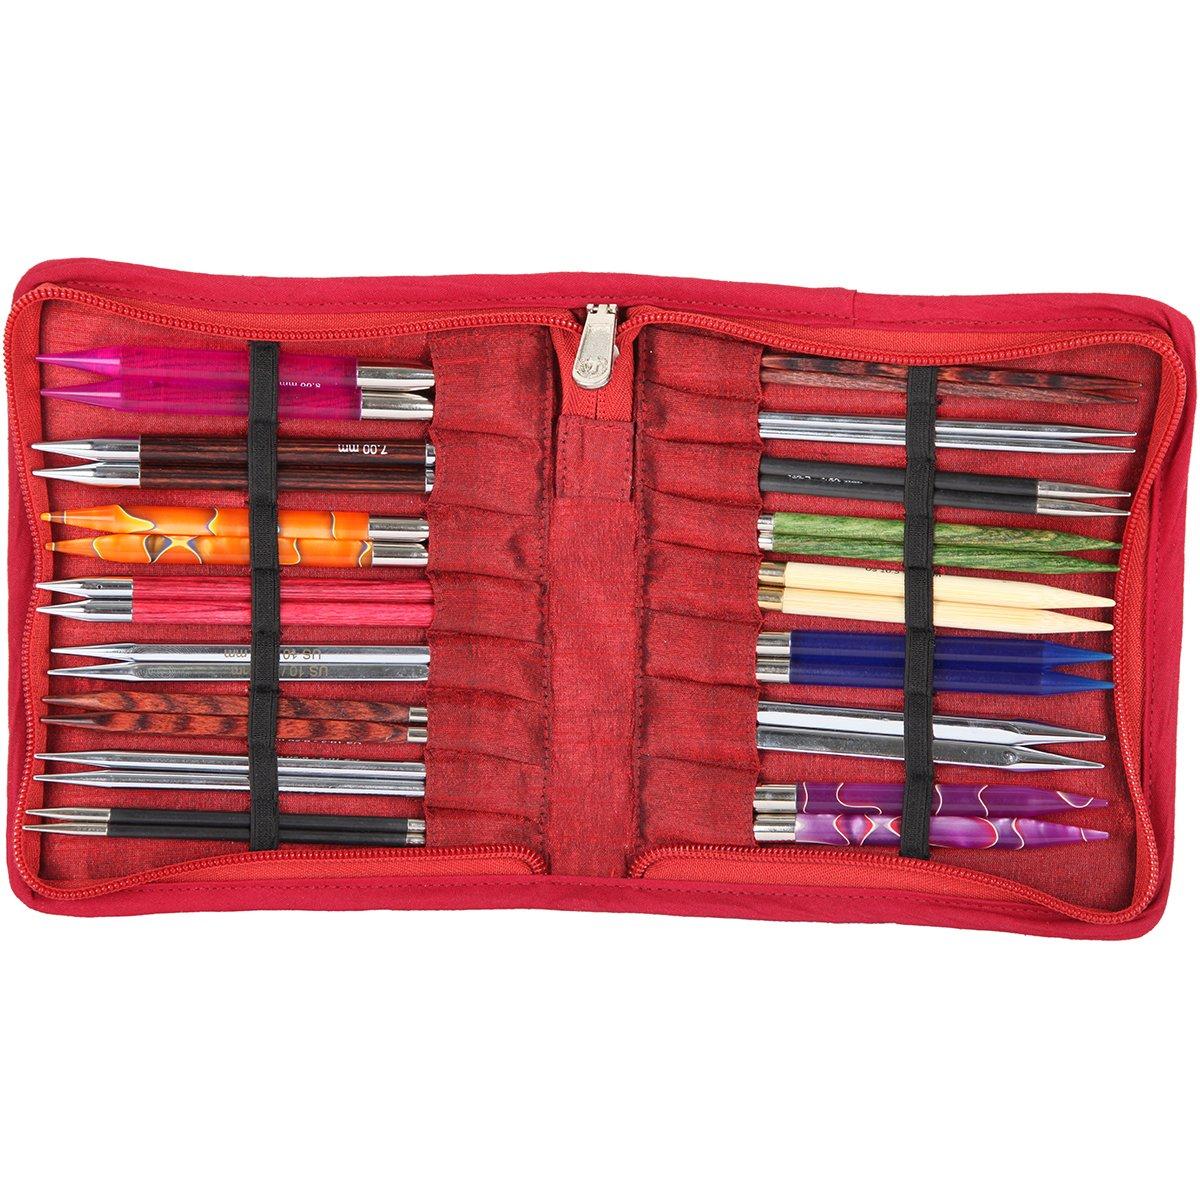 Knitters Pride 810001 Aspire Interchangeable Needle Case